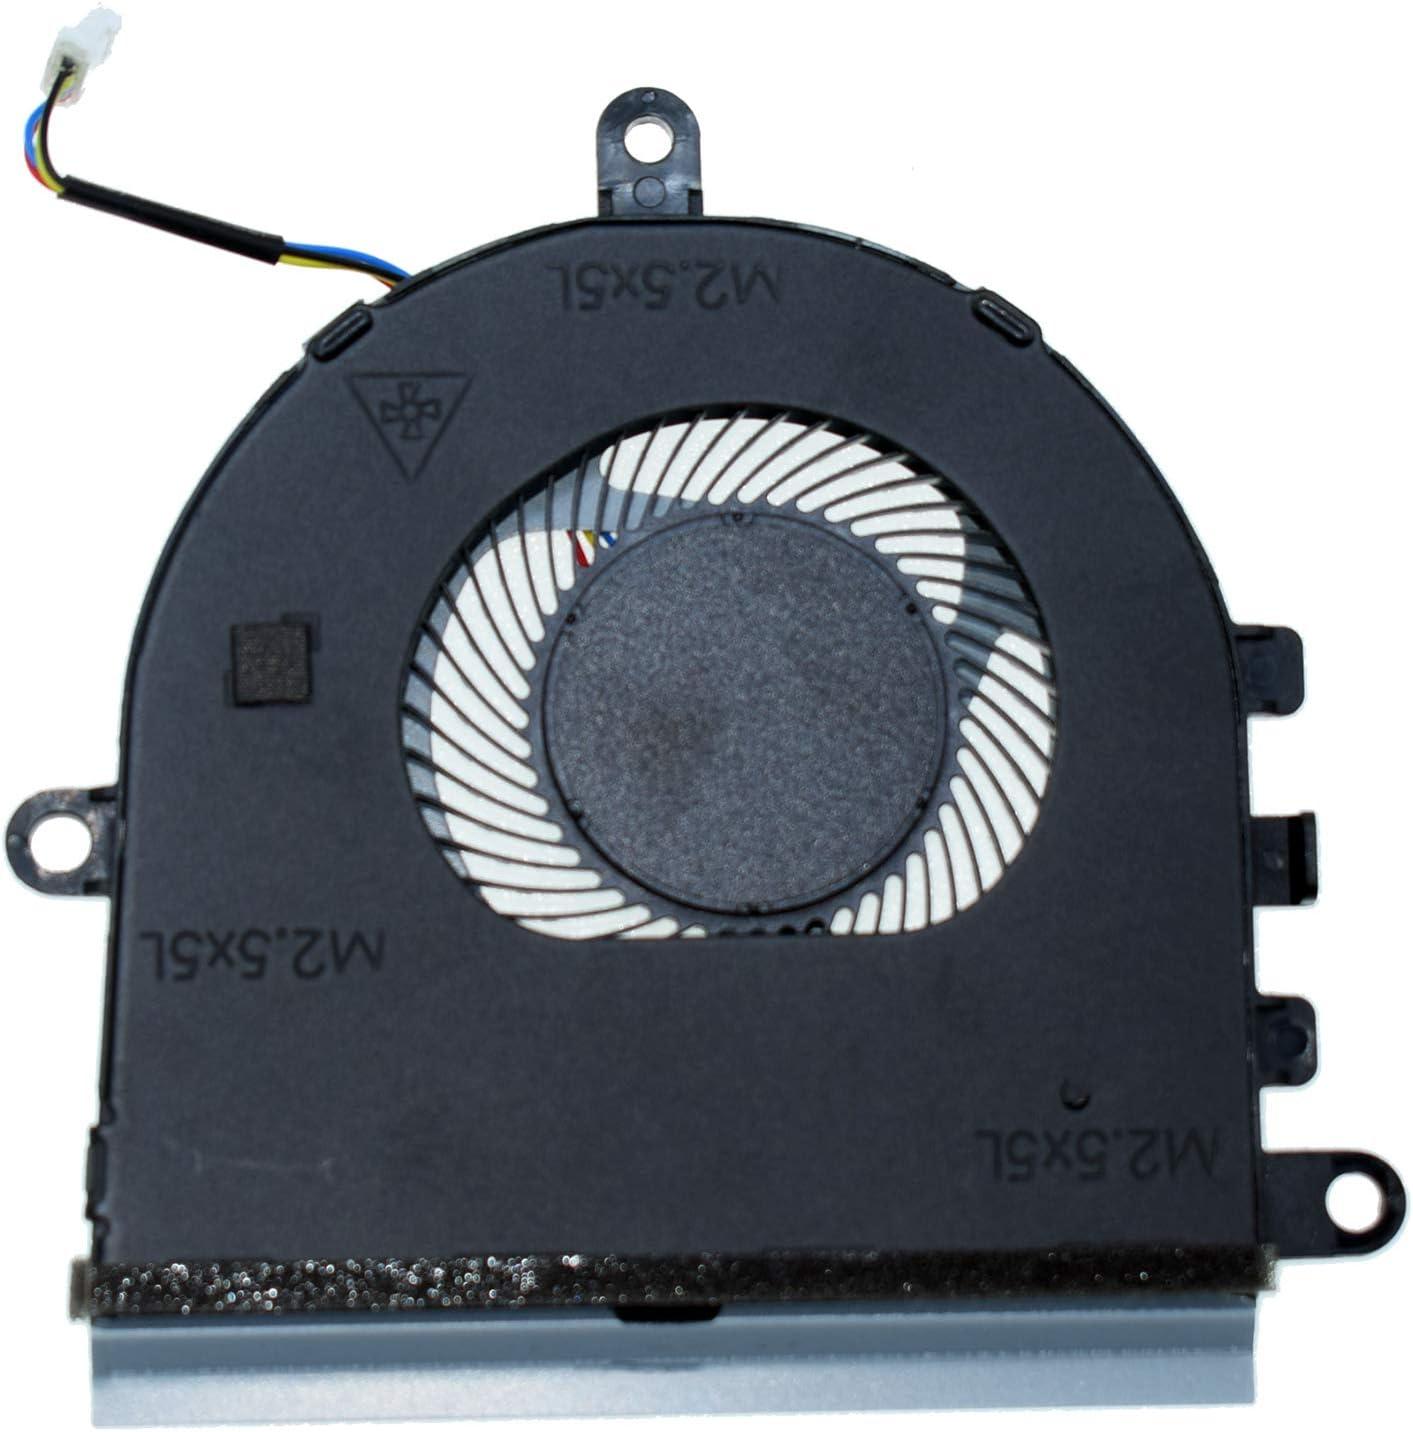 DREZUR CPU Cooling Fan for Without CD-ROM Version Del Inspiron 15 5570 5575 3533 3583 3585 5593 Series Laptop Cooler CN-07MCD0 7MCD0